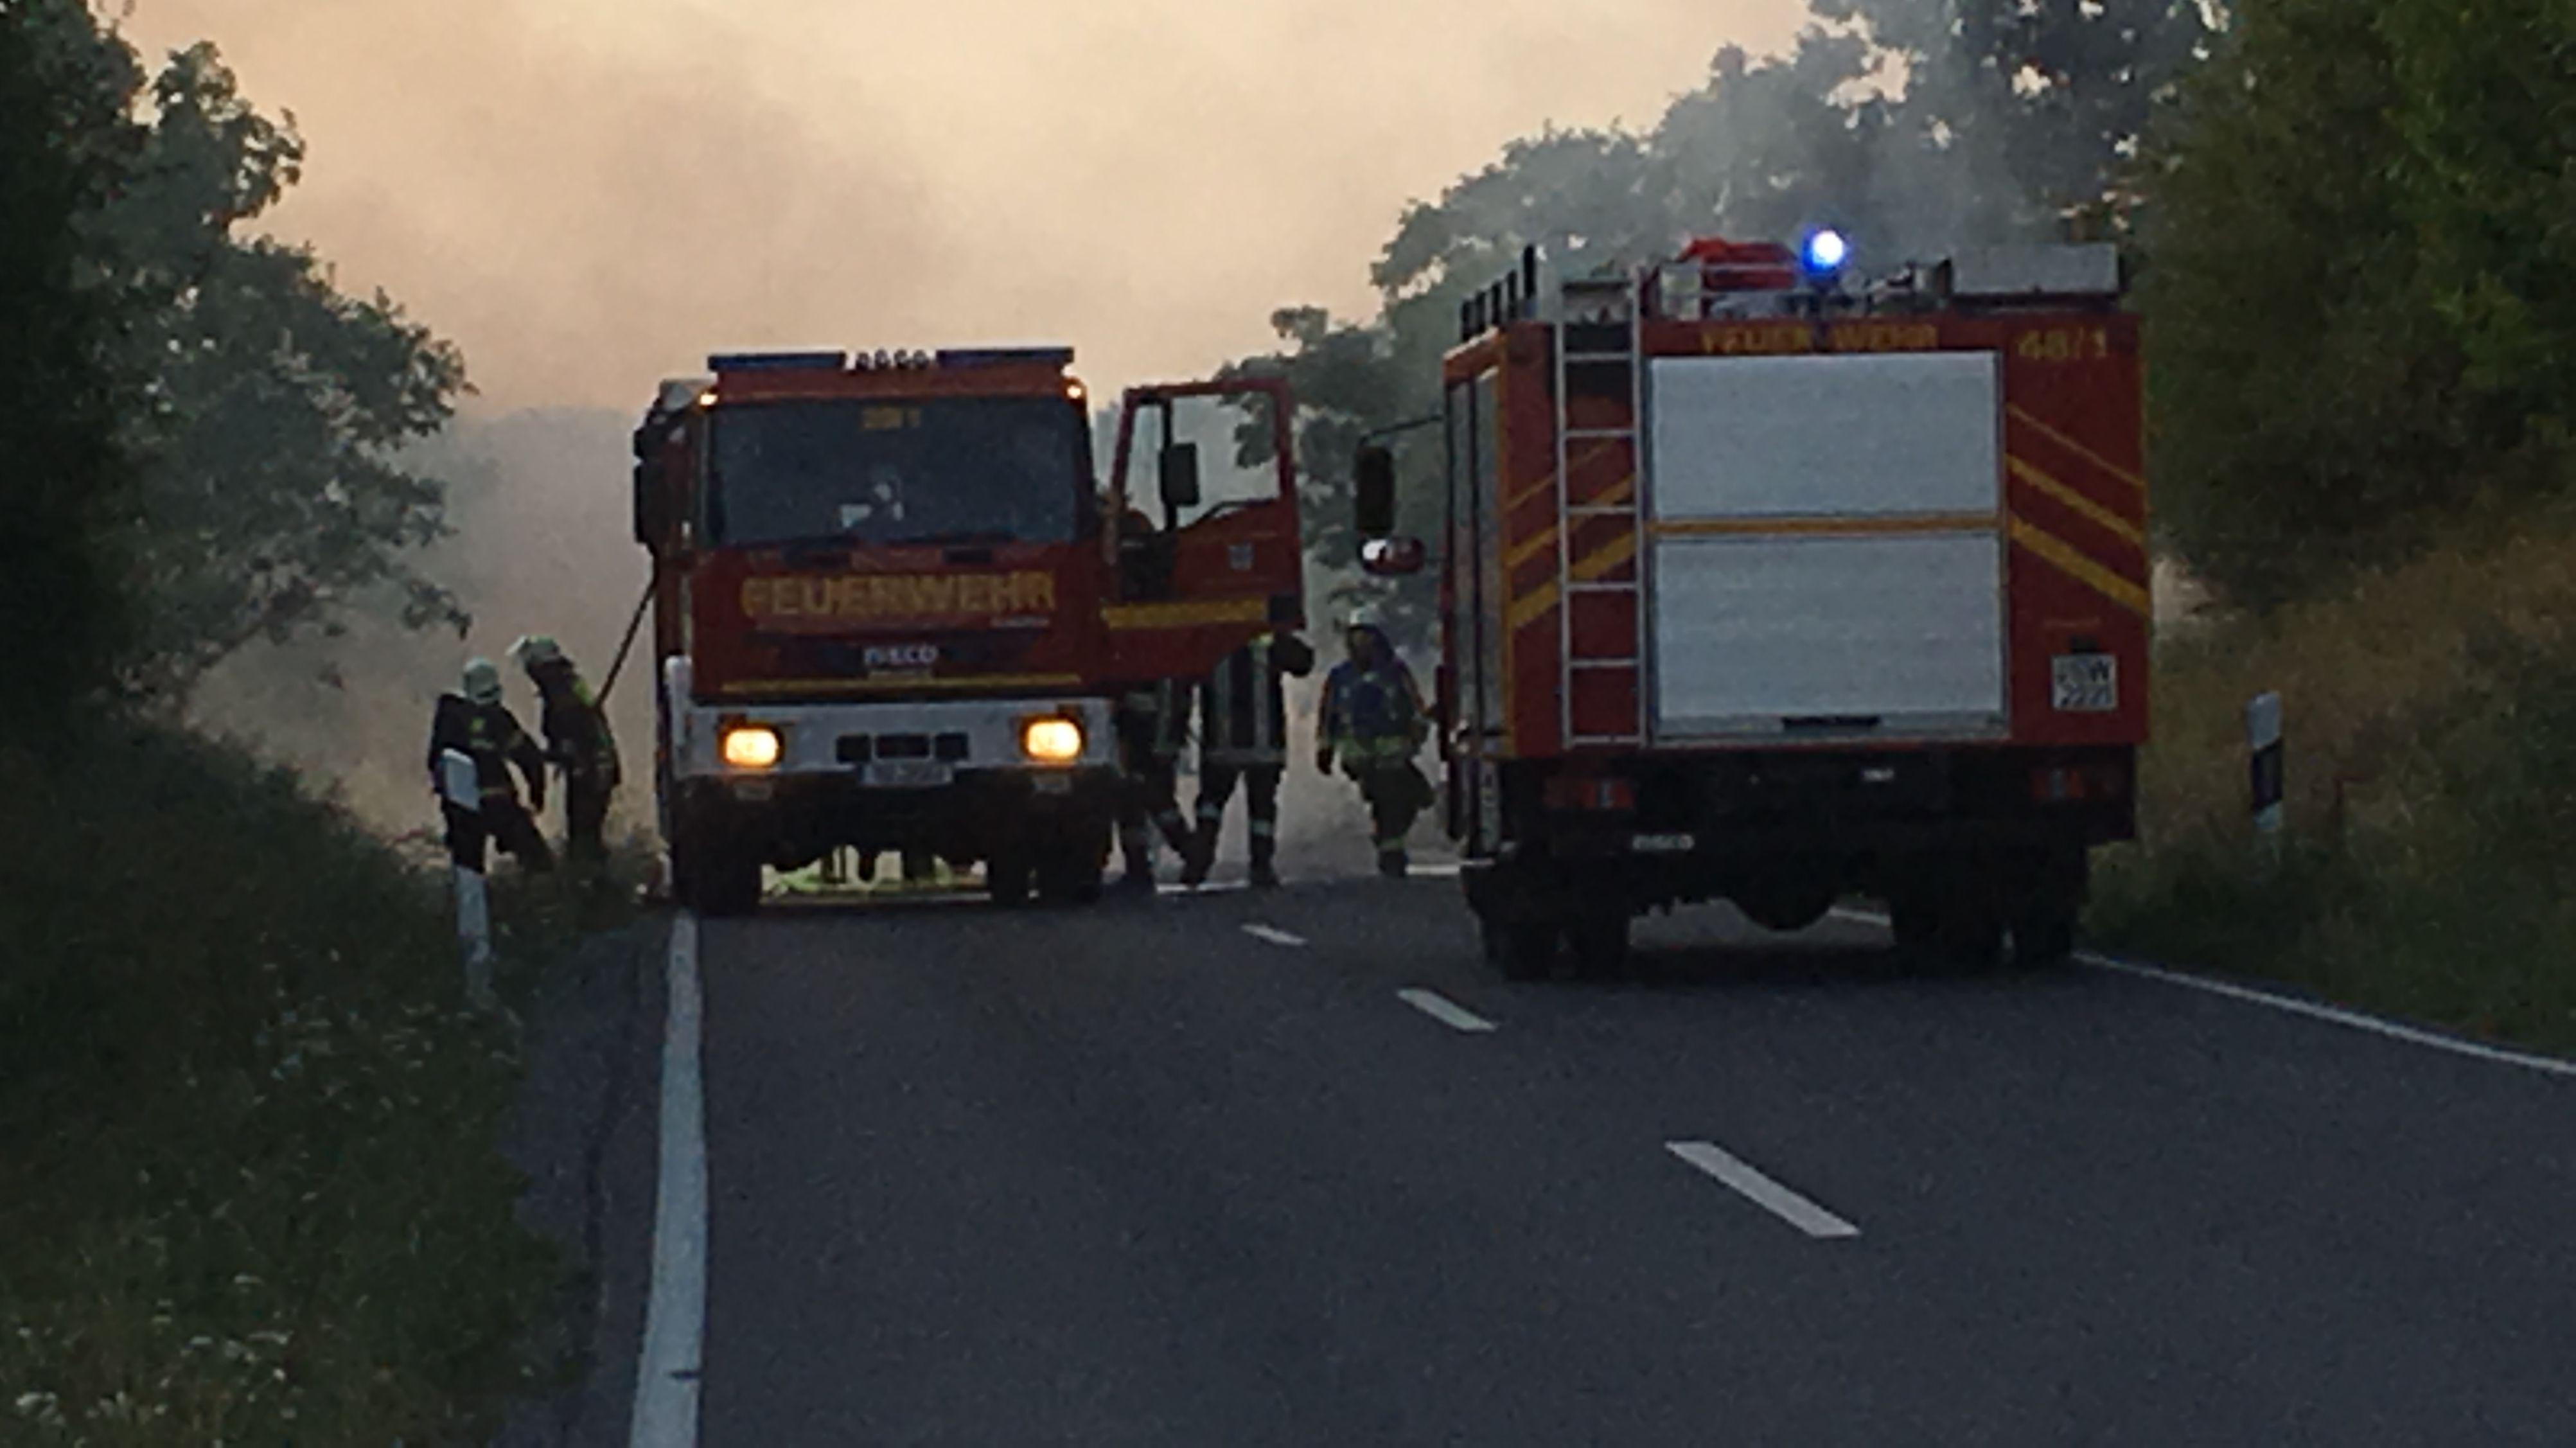 Feuerwehr löscht brennenden Mähdrescher bei Thundorf (Lkr. Bad Kissingen)